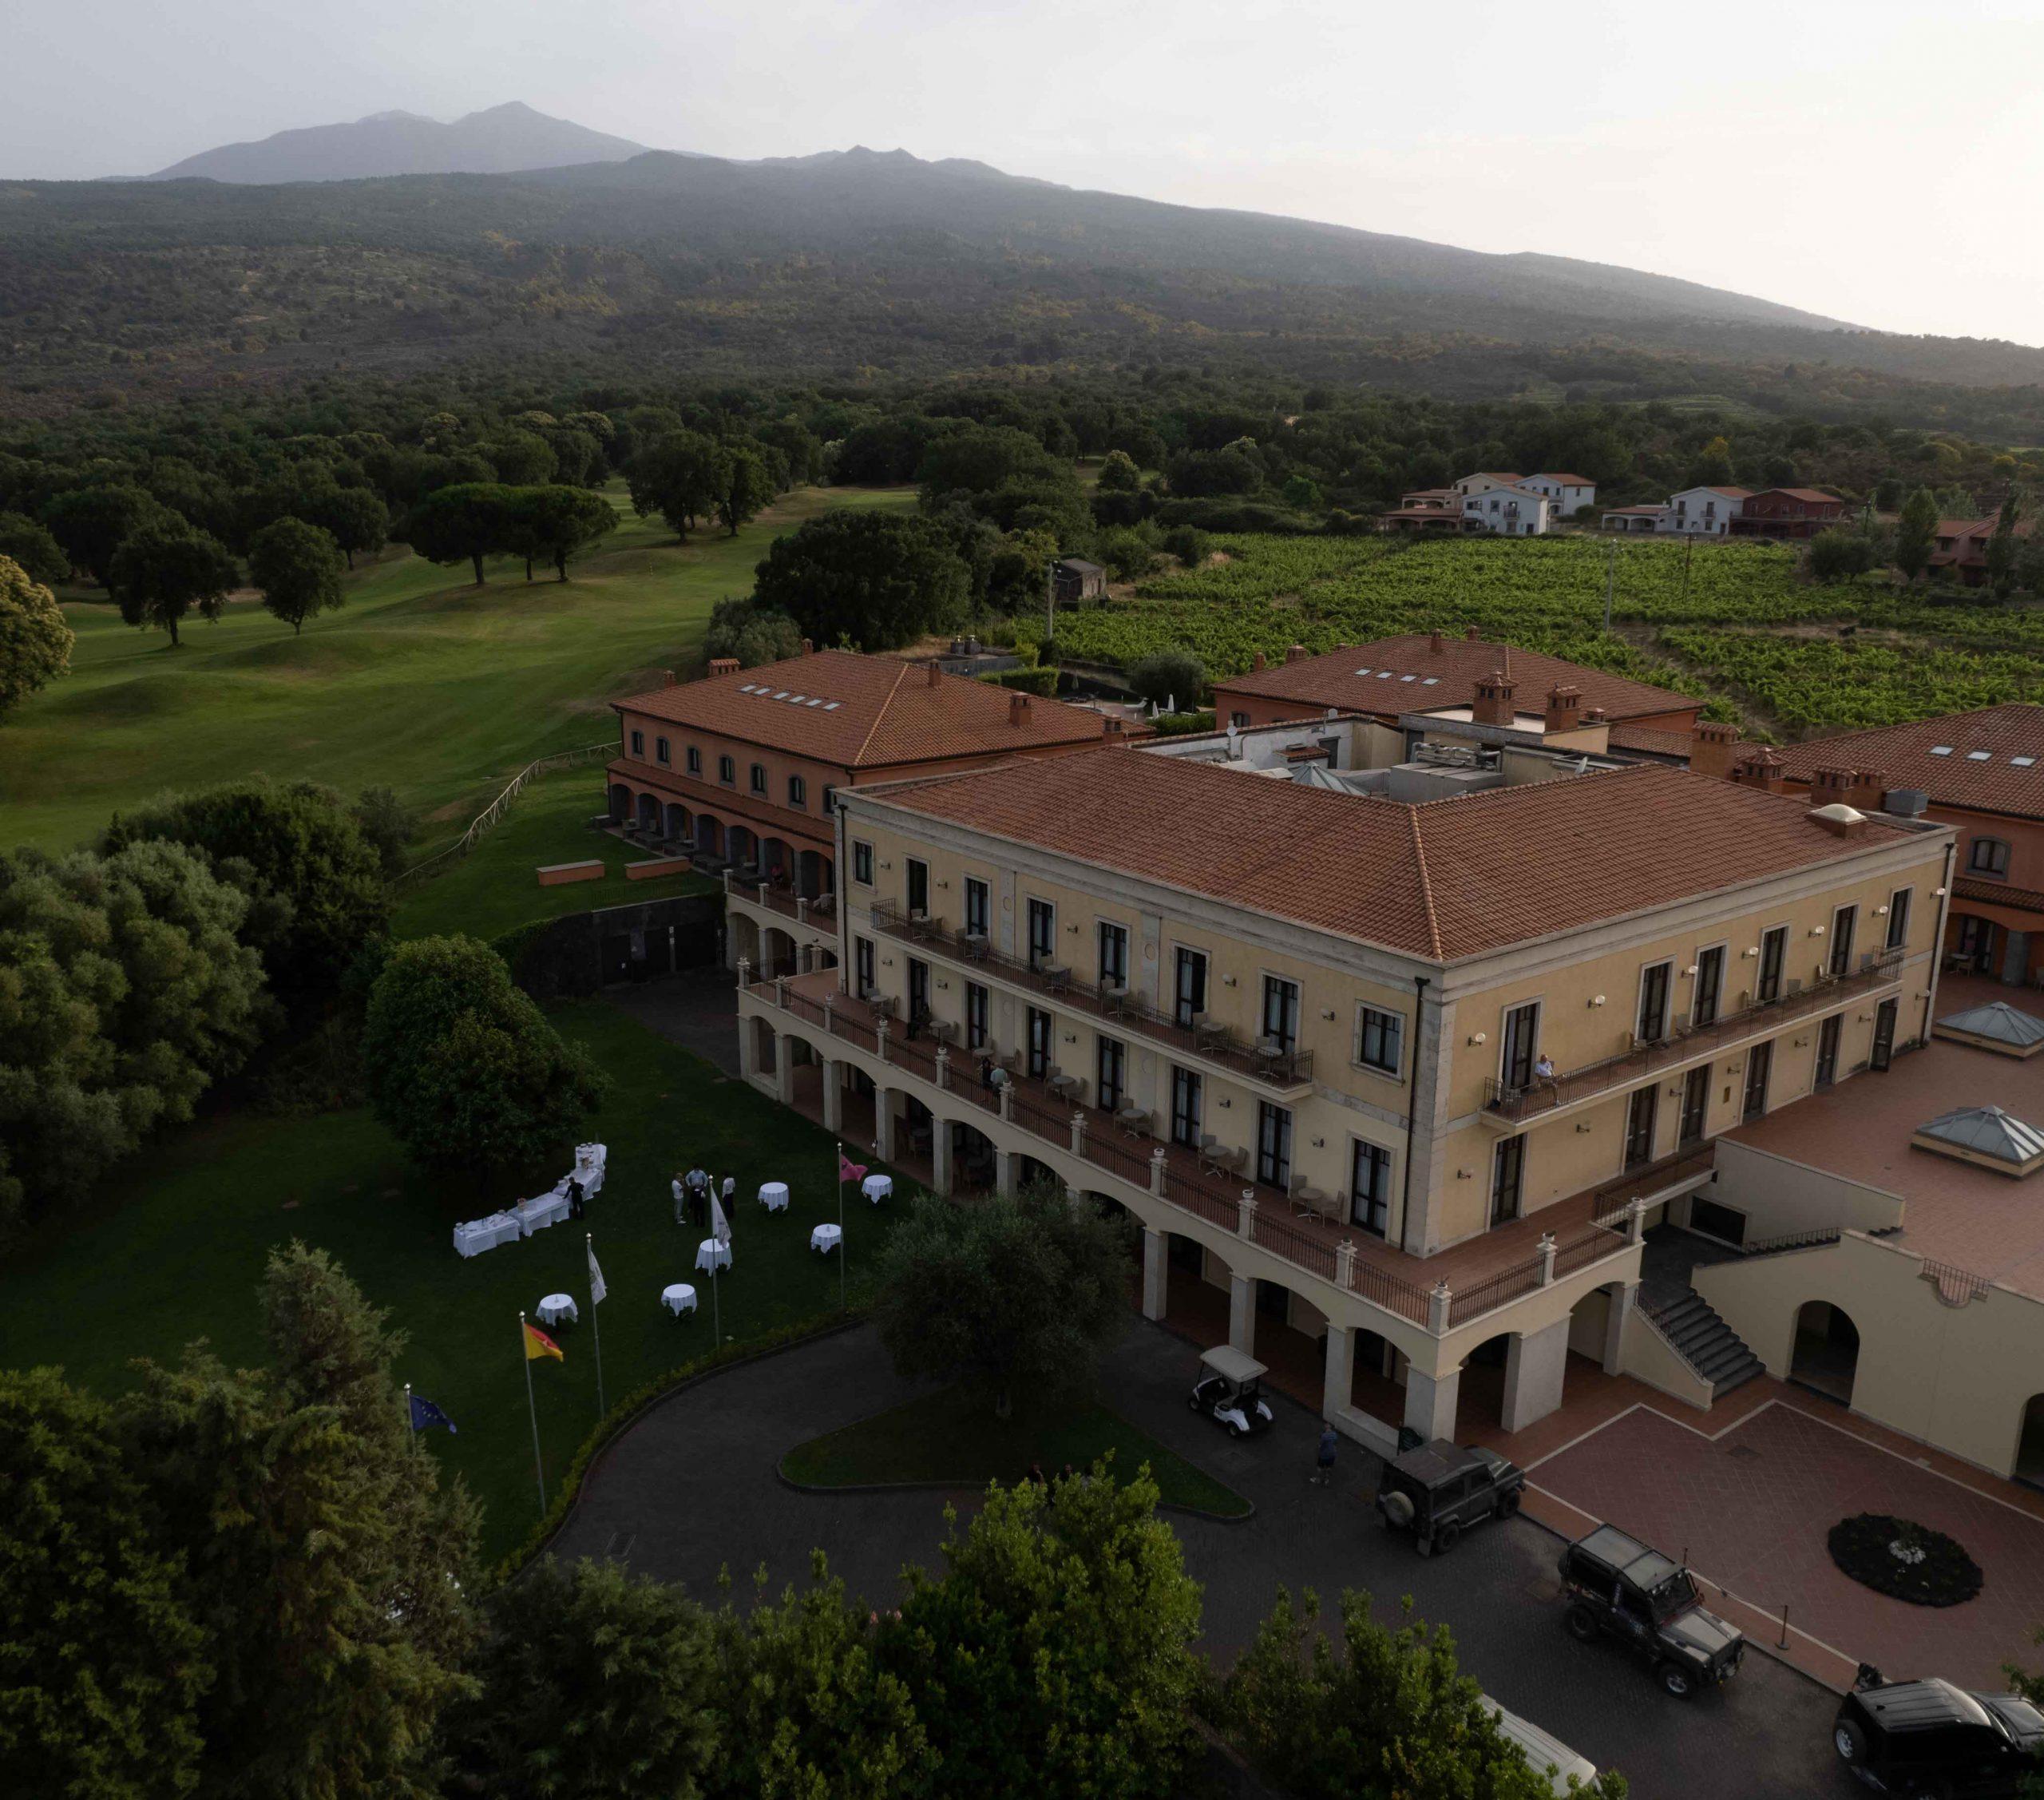 Land_Rover_Tour_Sicilia_2021_Land_Rover_Experience_Italia_-95